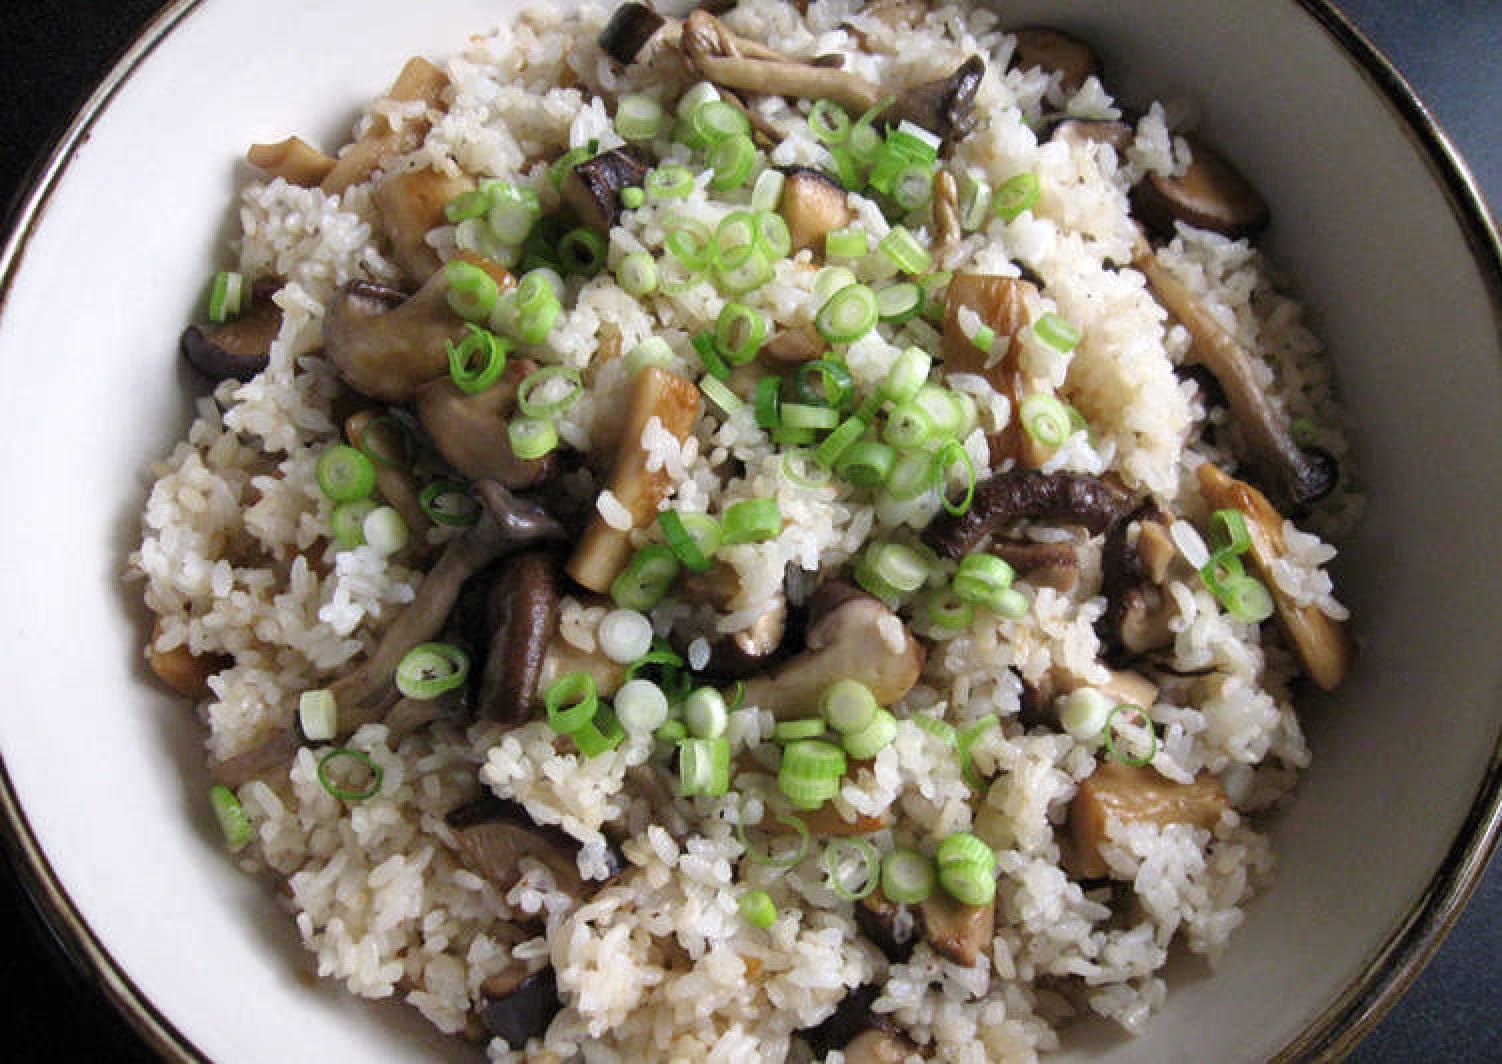 Asian Mushrooms & Garlic Mazegohan